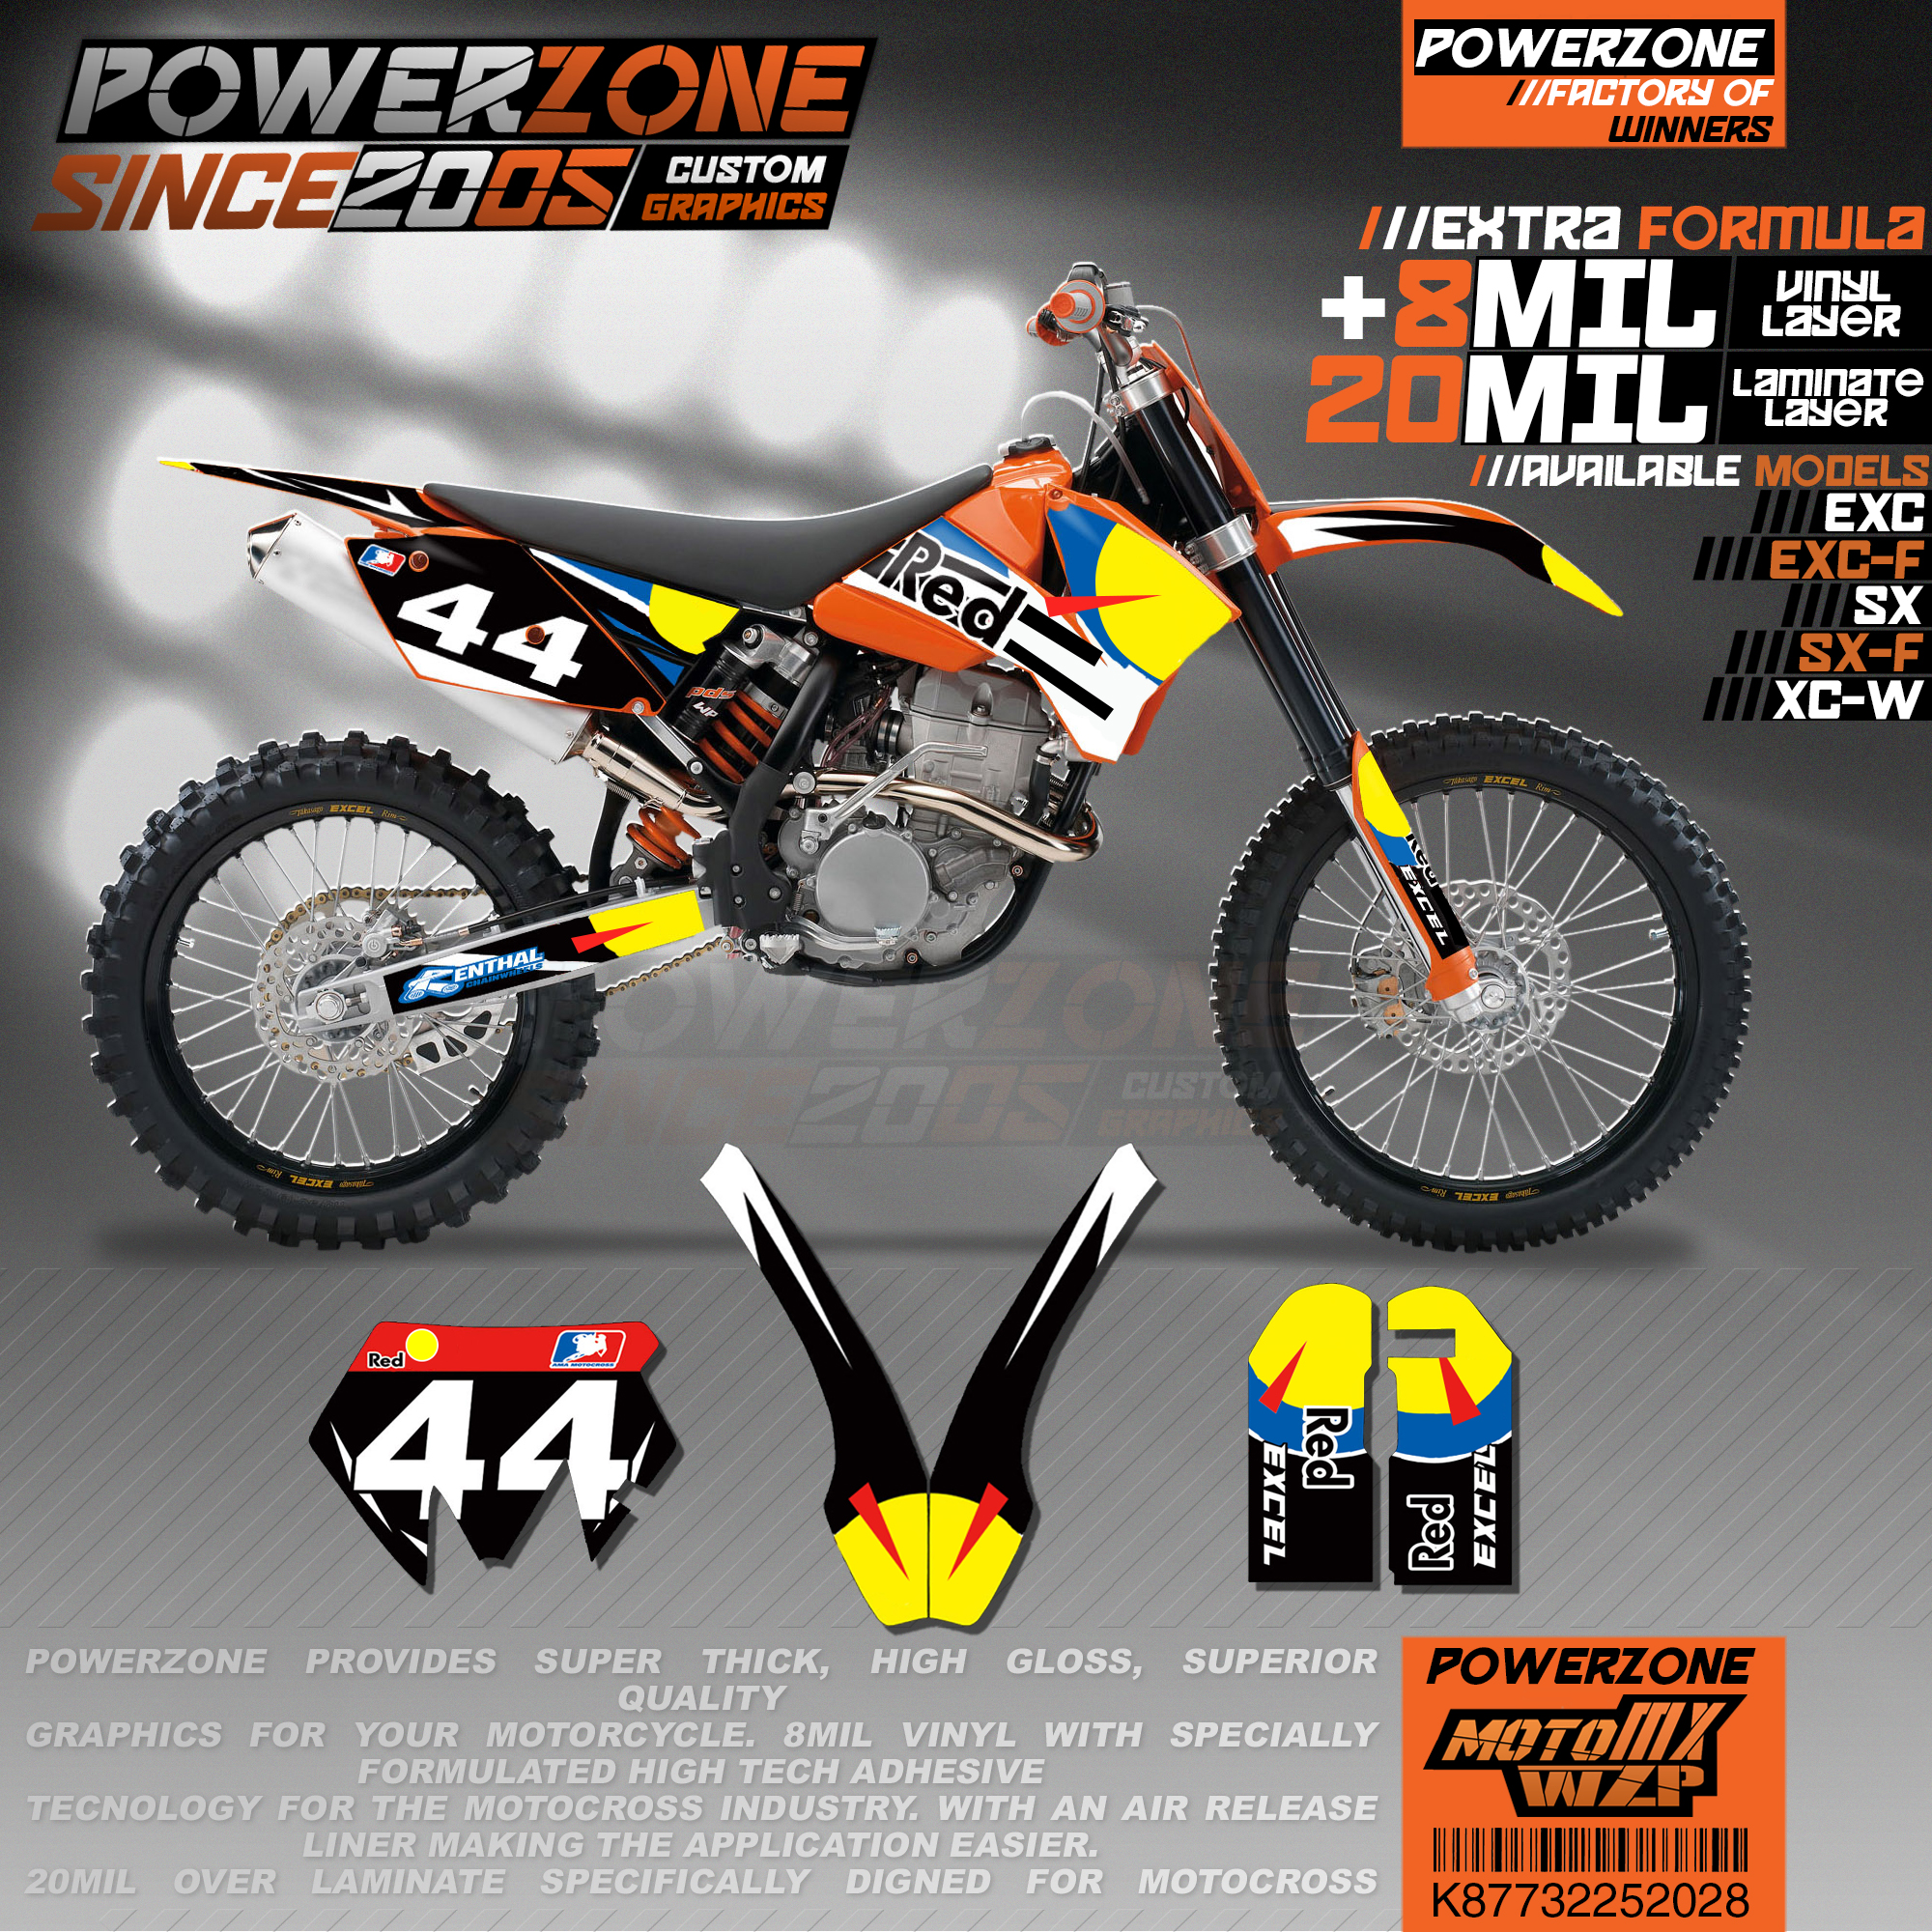 PowerZone на заказ футбольной команды Графика Фоны наклейки 3m Набор наклеек для KTM SX SXF MX EXC xcw Enduro 125cc к 500cc 2003-2007 028